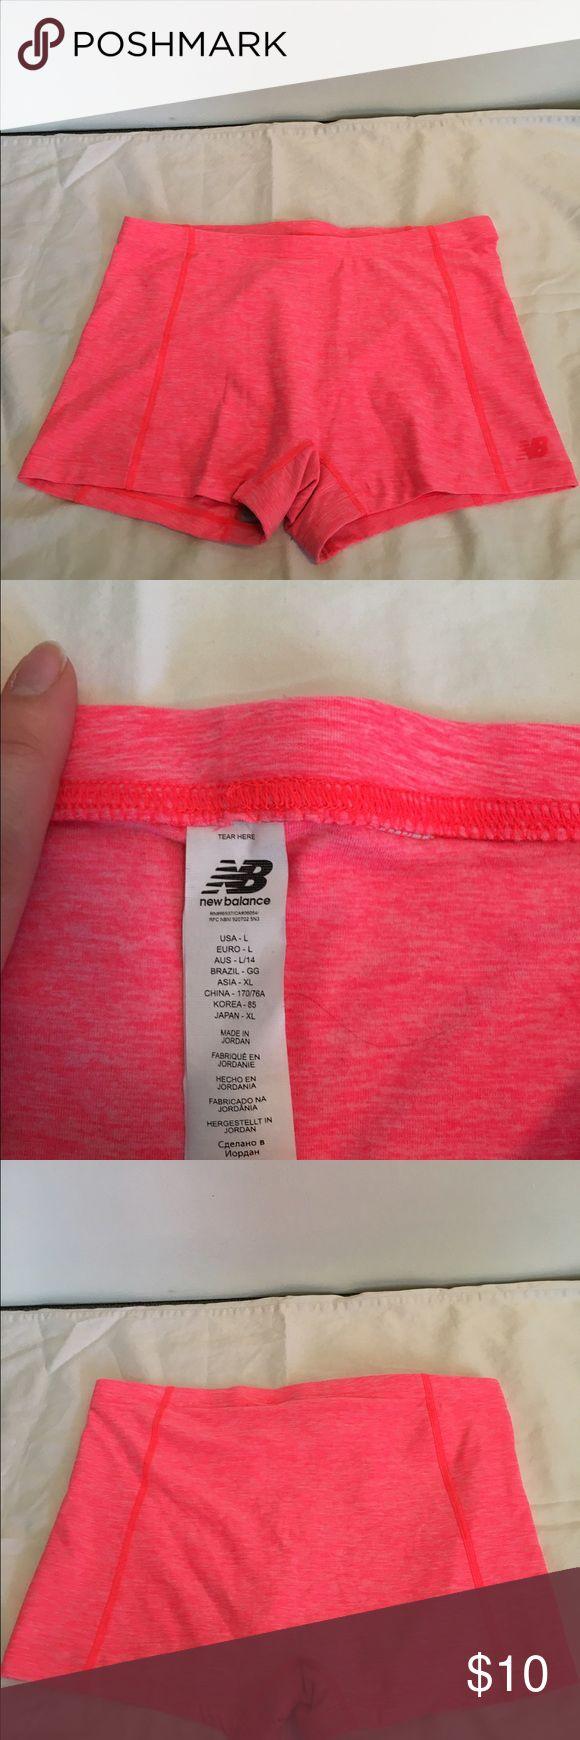 Selling this Women's Pink New Balance Spandex Shorts on Poshmark! My username is: jgarbinski. #shopmycloset #poshmark #fashion #shopping #style #forsale #New Balance #Pants